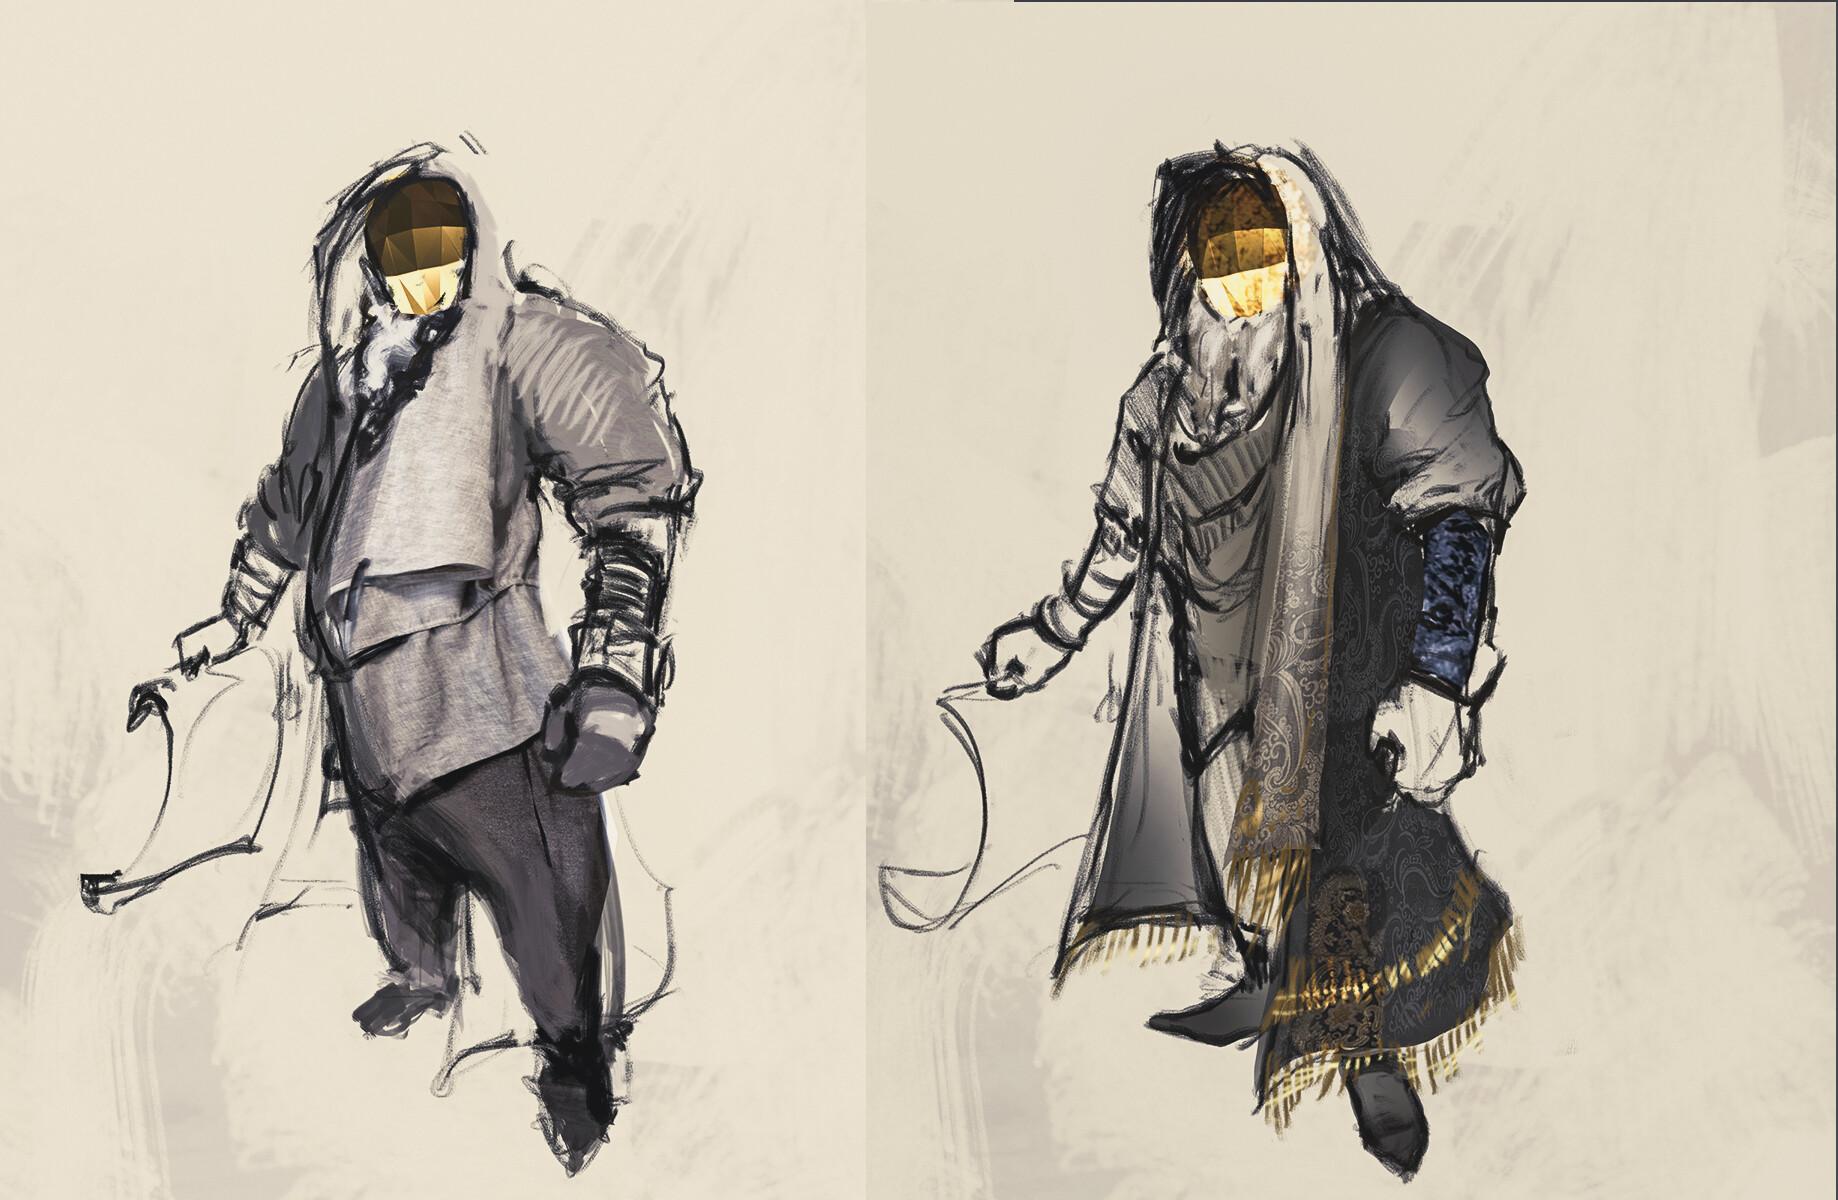 Yeve drovossekova sketch1